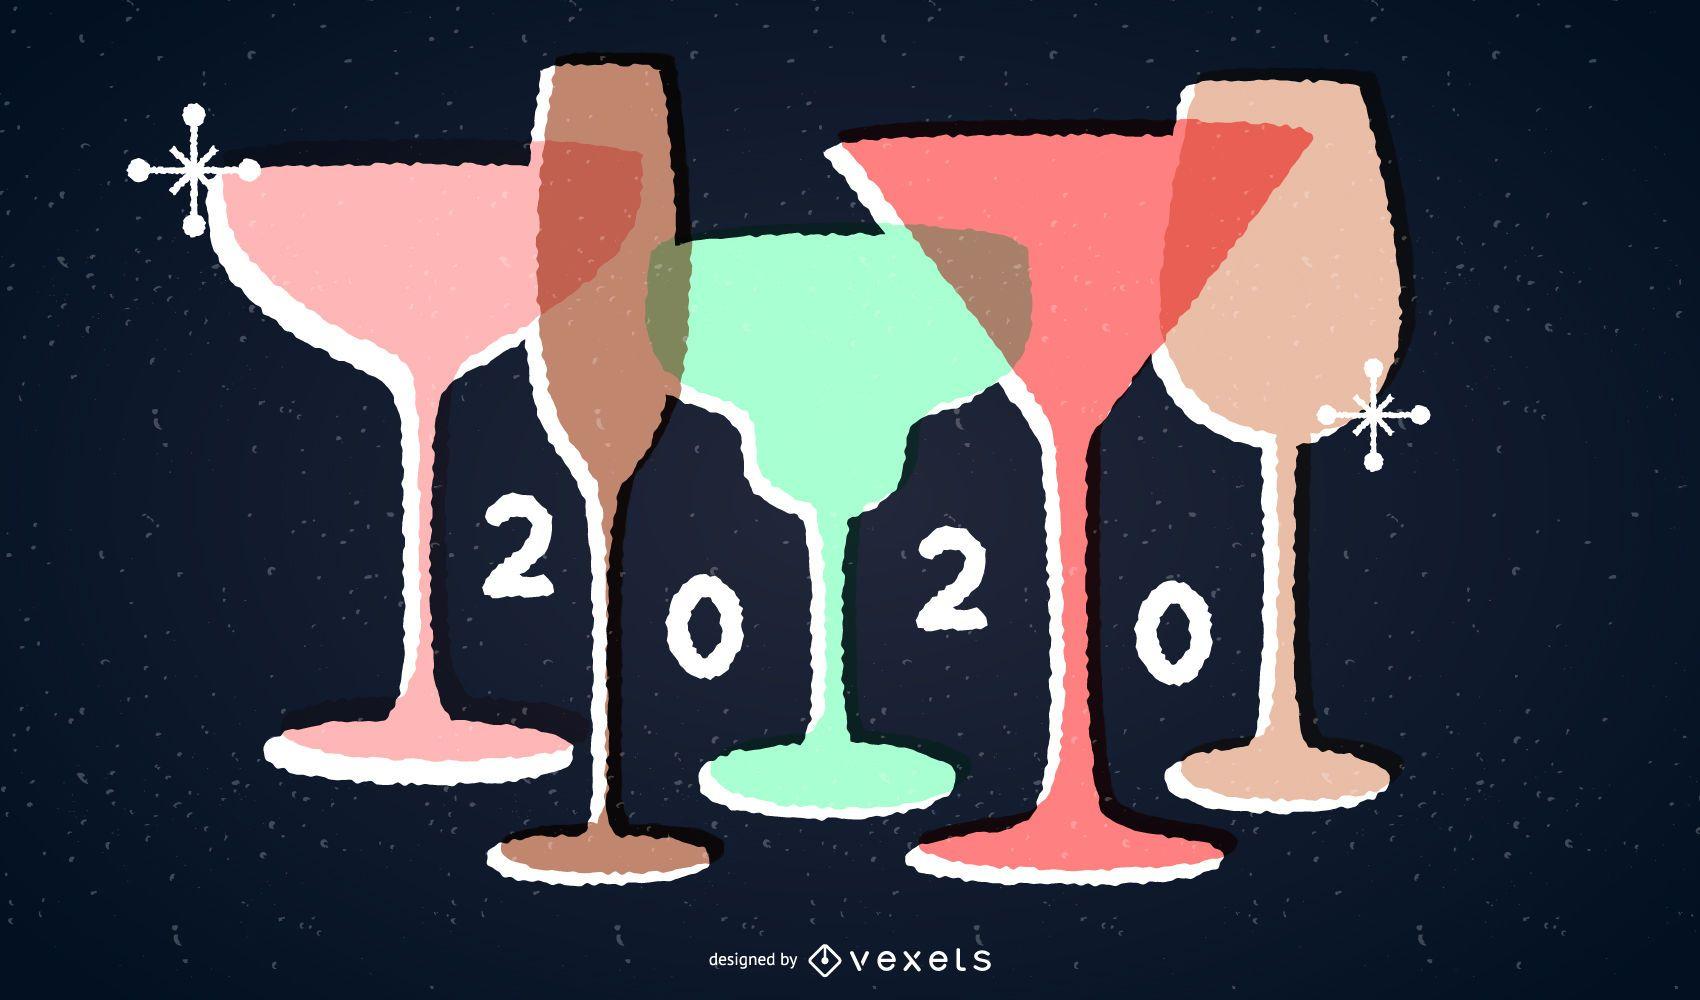 New Year 2020 Vintage Drinking Glasses Illustration